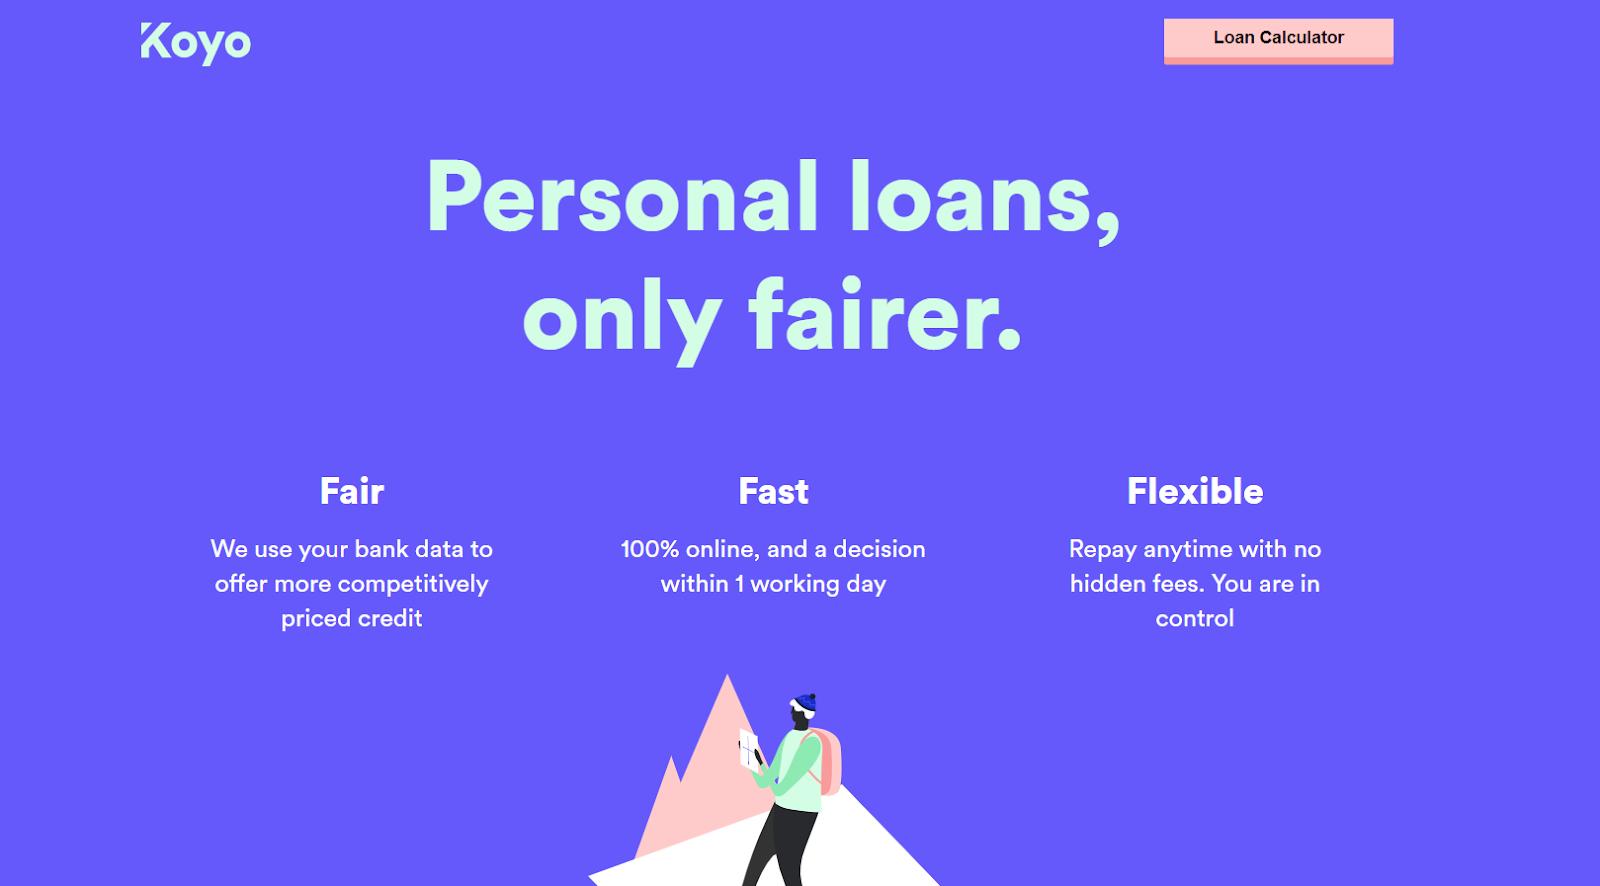 most successful financial technology start-ups 2021 koyo